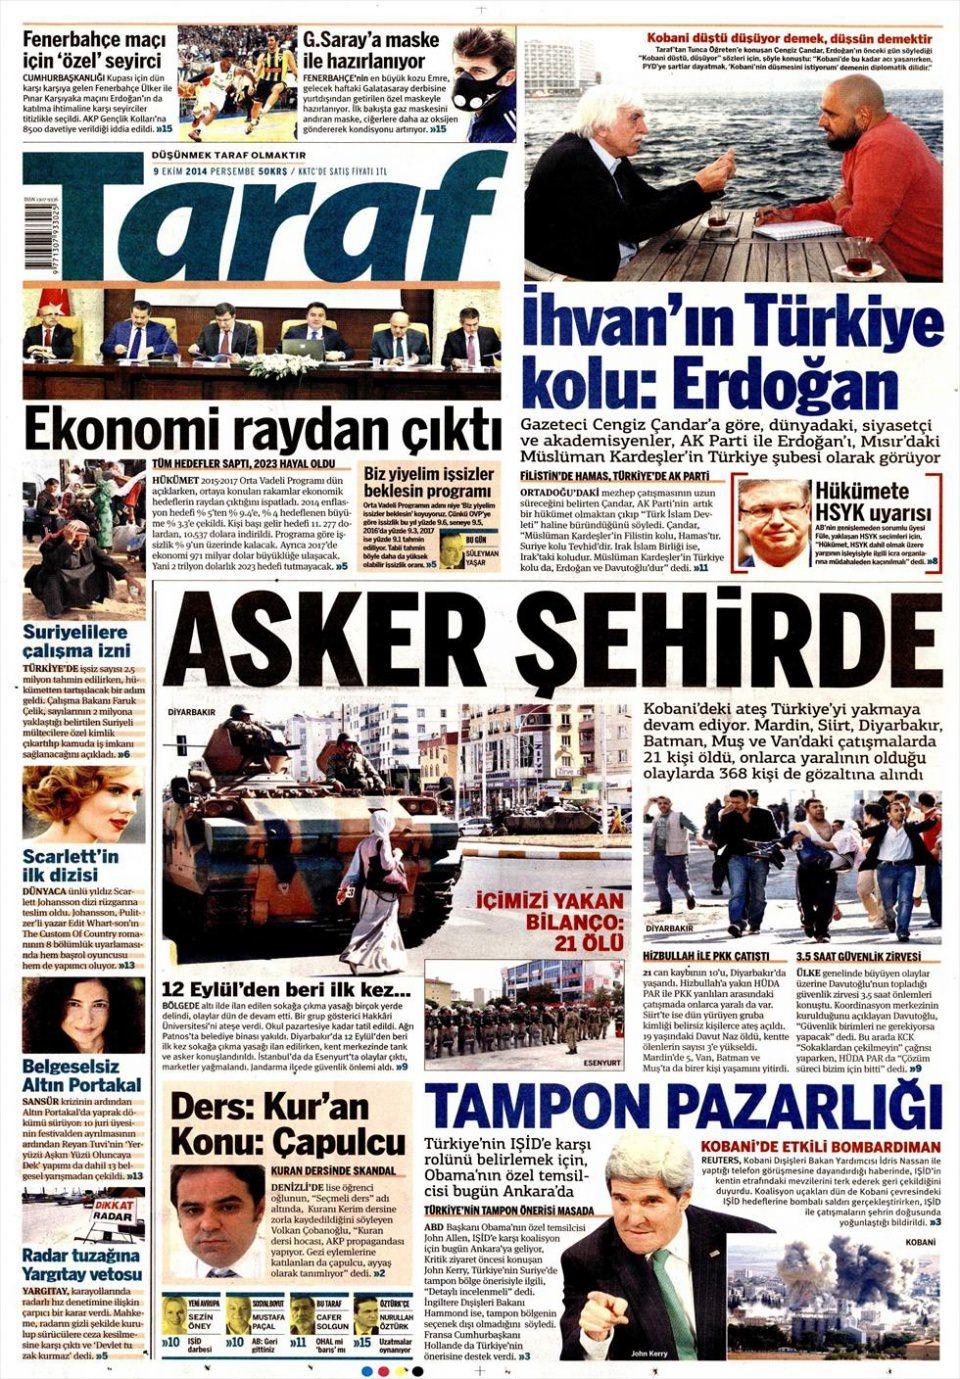 9 Ekim Gazete Manşetleri 19